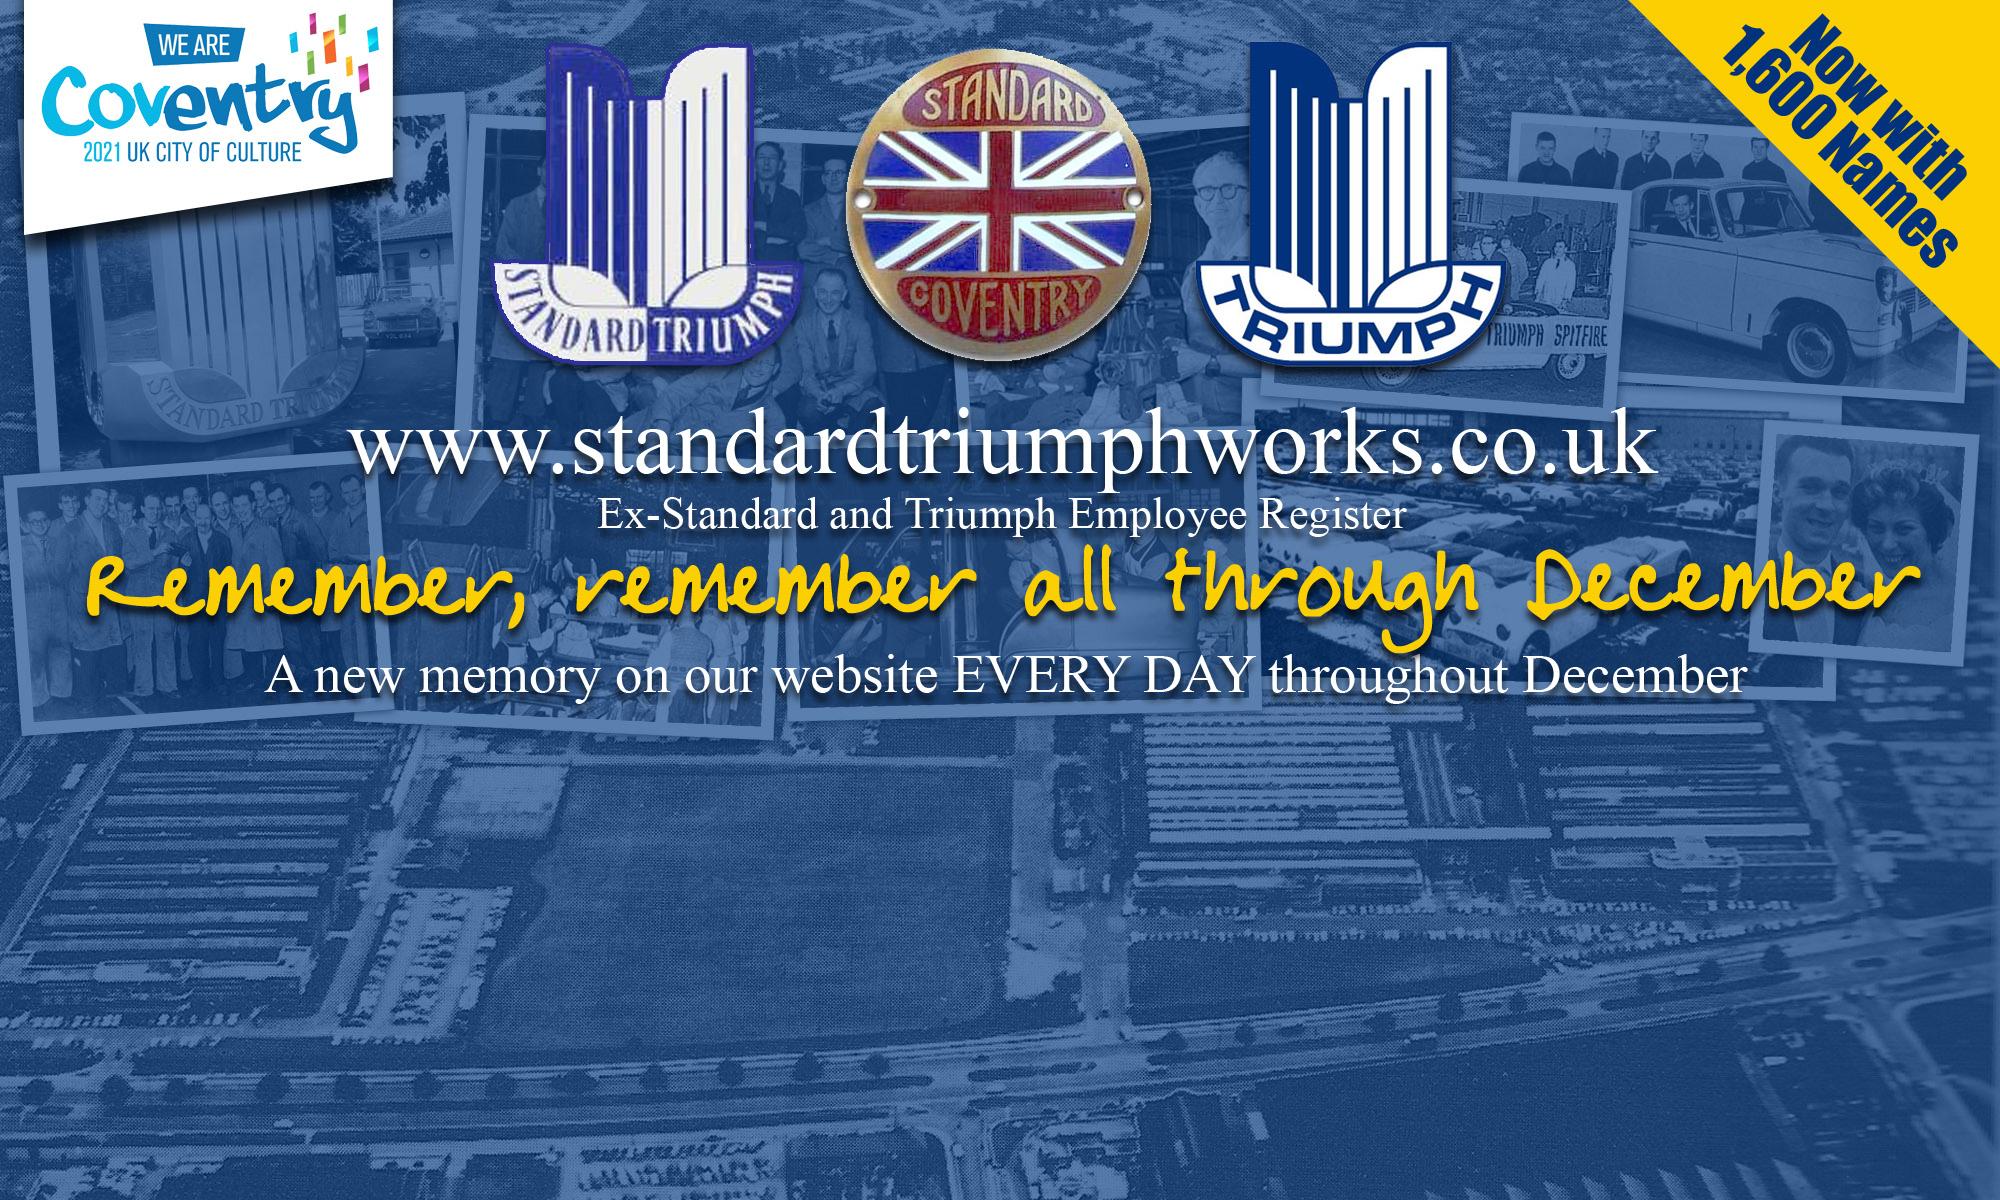 Standard Triumph